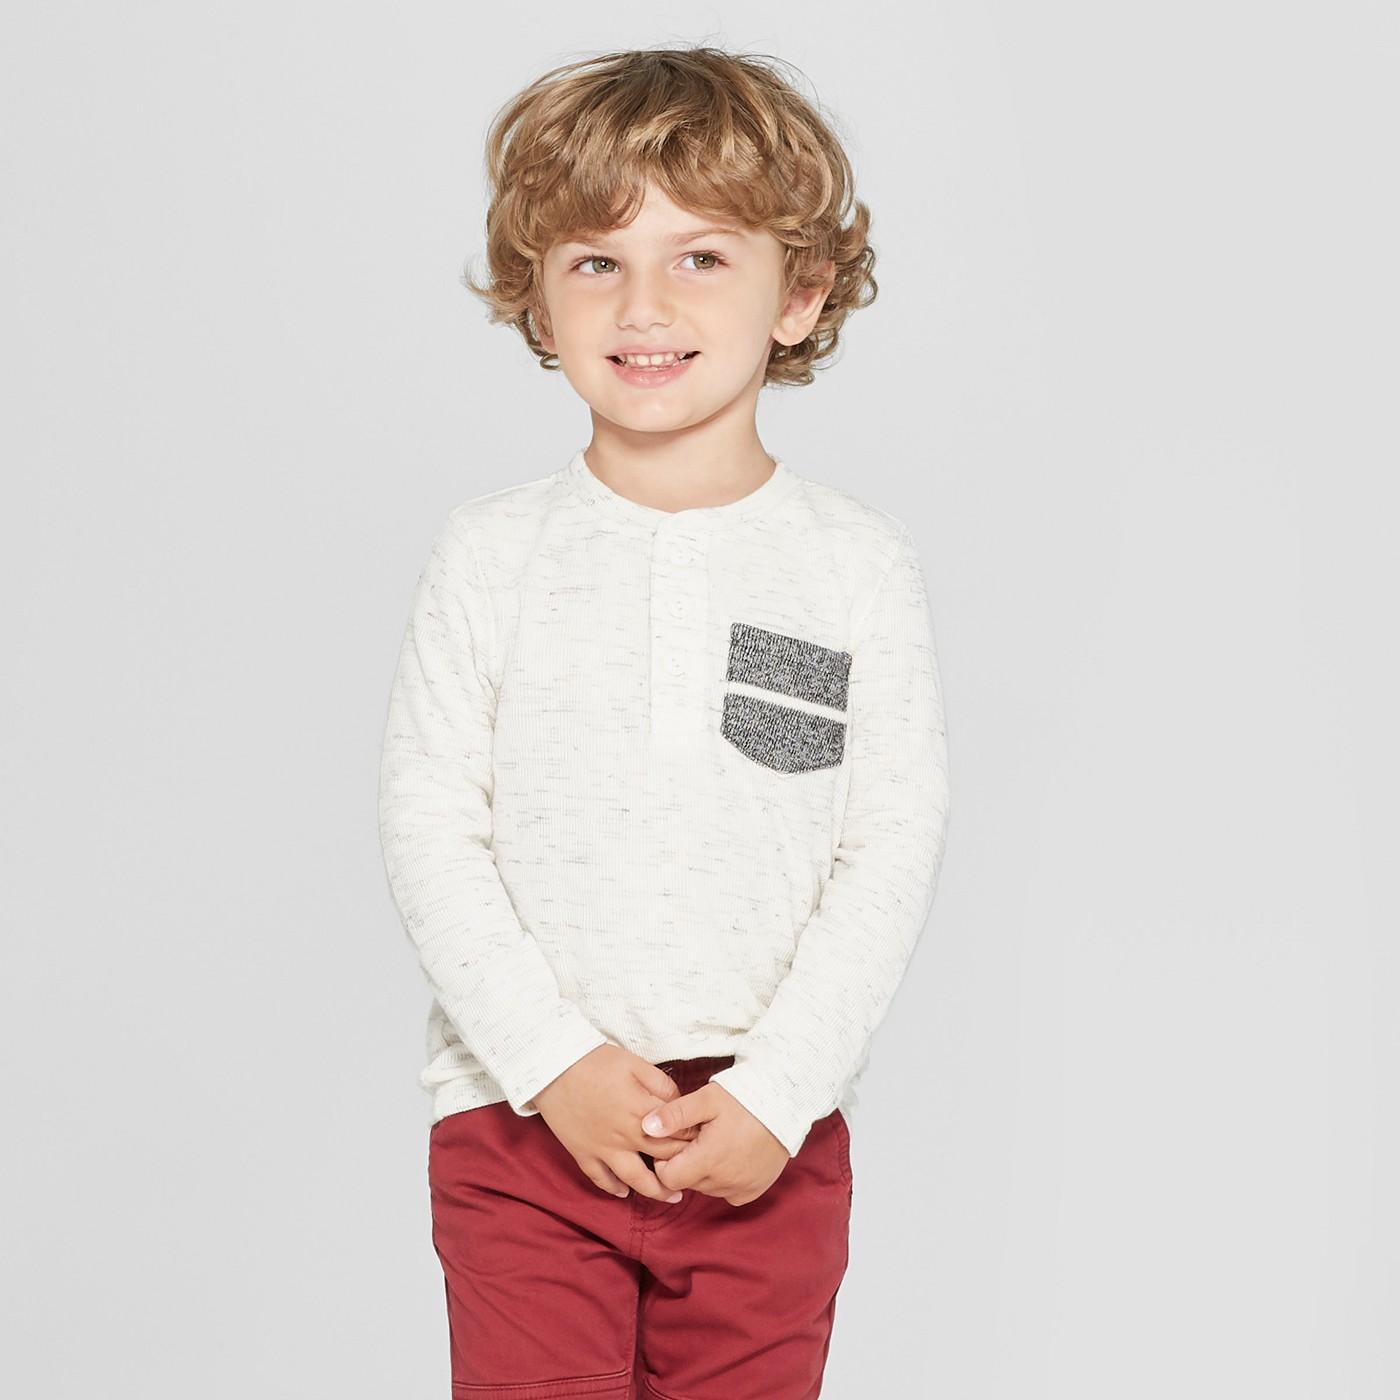 Target Toddler Boys' Long Sleeve Henley Shirt – Cat & Jack™ Cream $6.99